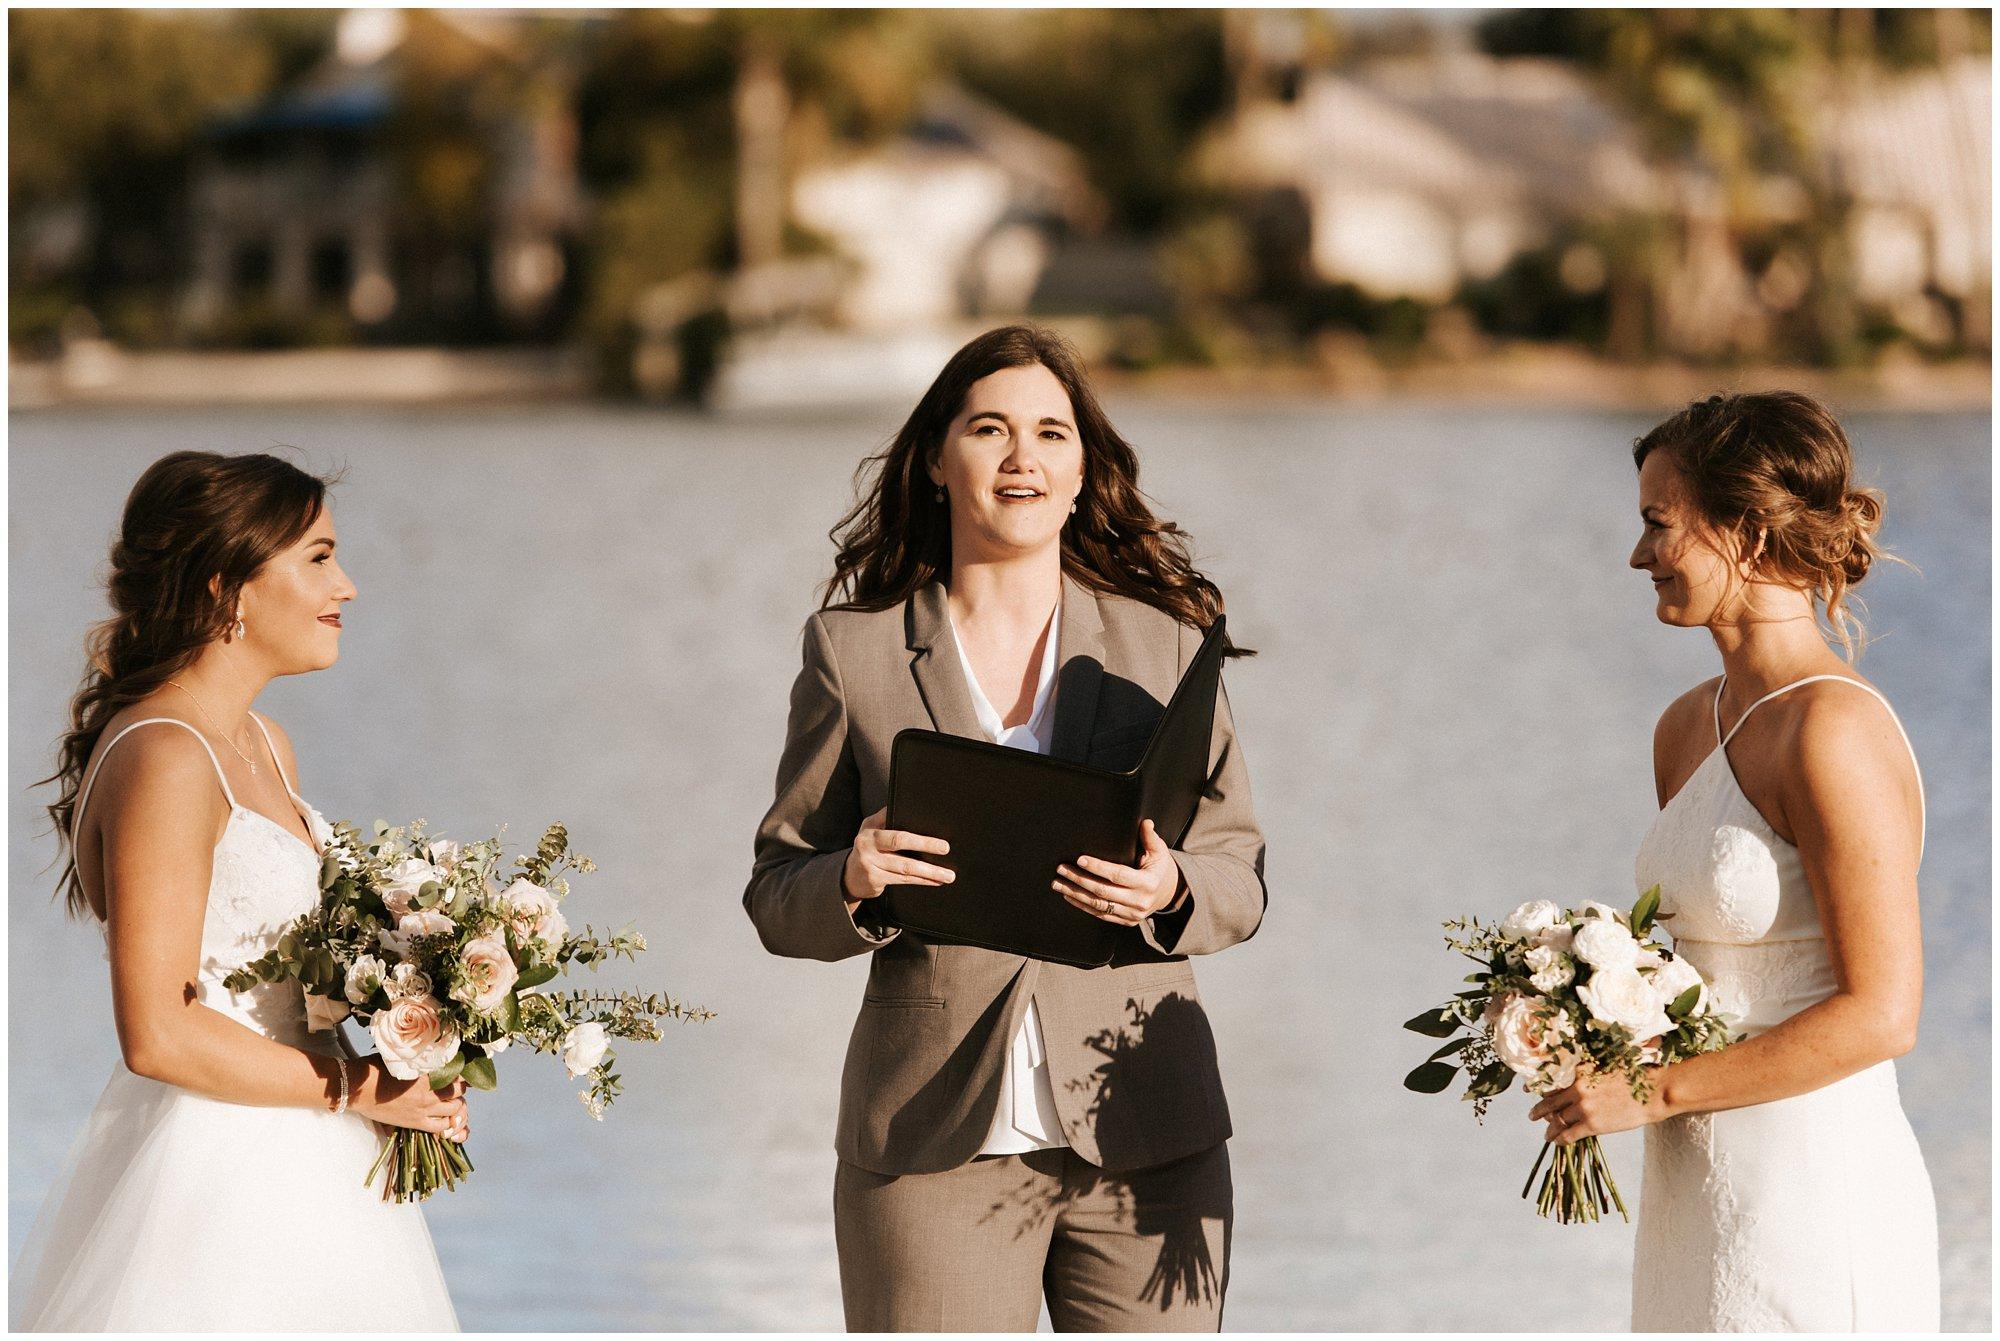 arizona same sex wedding photographer - jenni and lauren wedding the islands clubhouse_0061.jpg